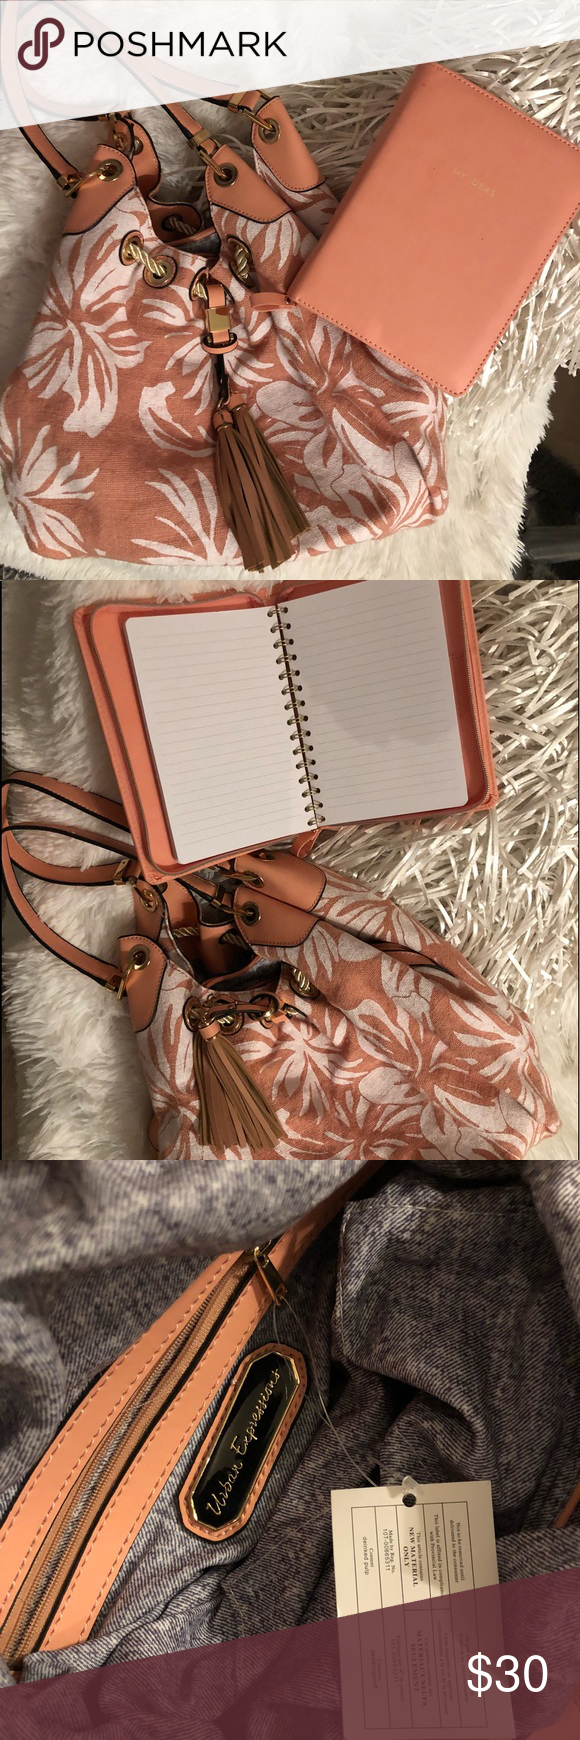 Handbag and journal set (Urban Expression Vegan) NWT (With